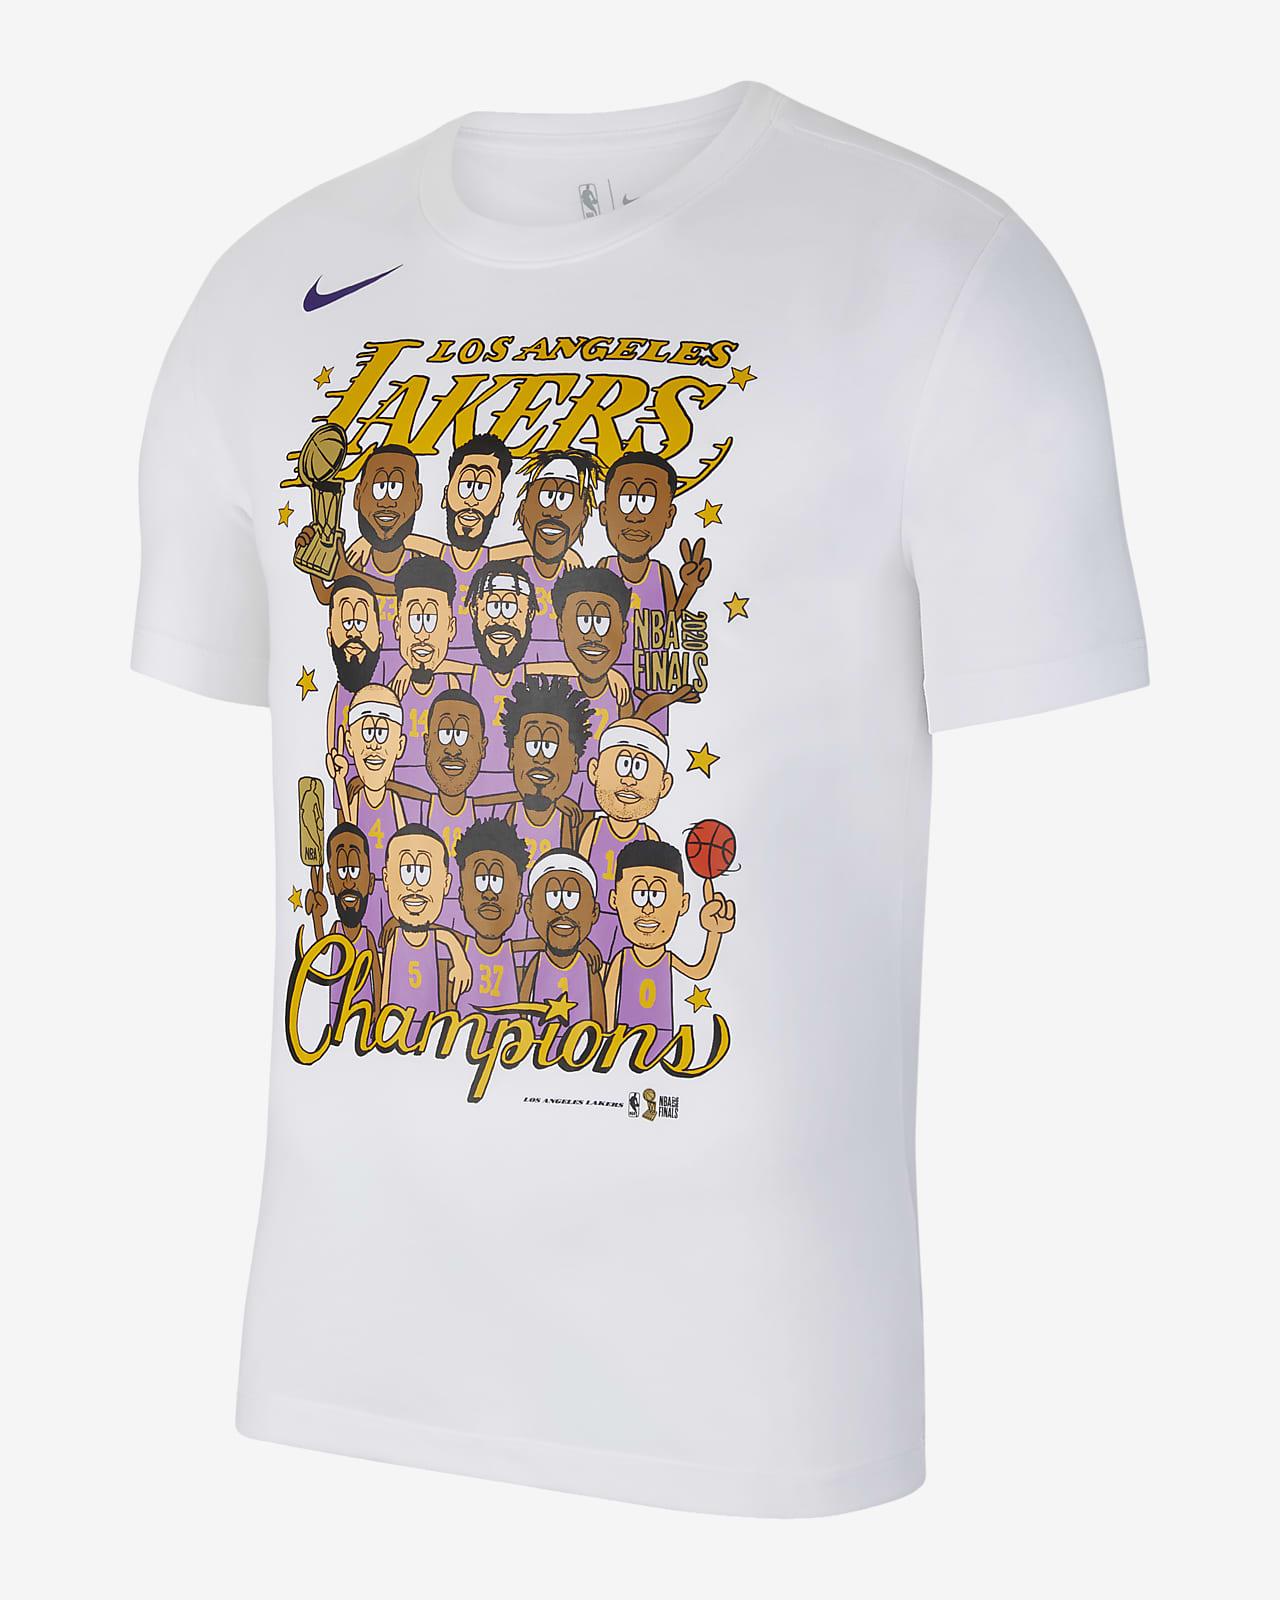 洛杉矶湖人队 Champions Nike NBA Roster 男子T恤